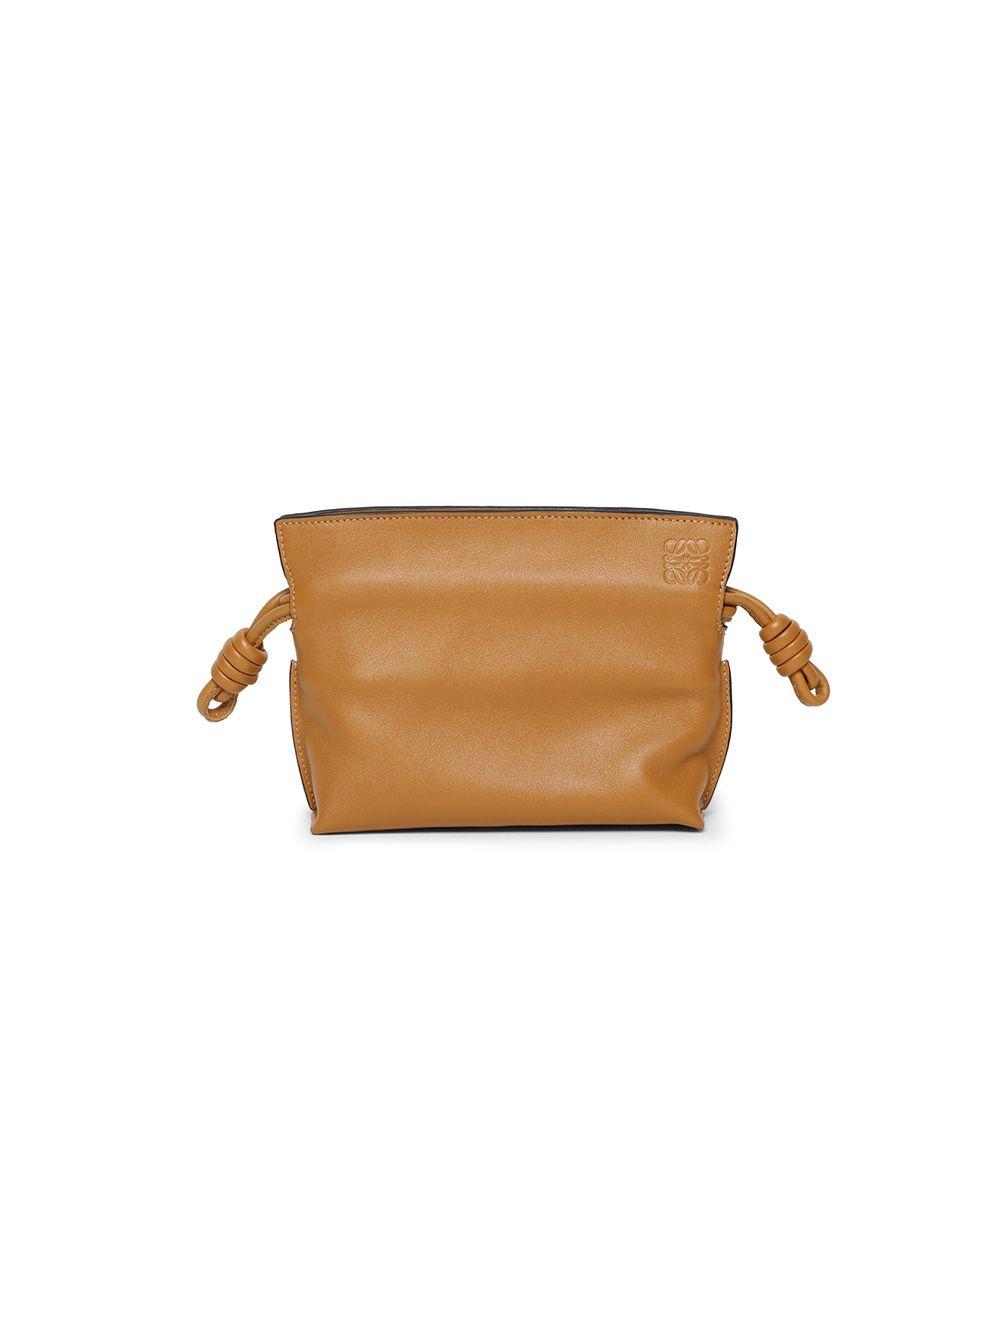 Nano Flamenco Leather Clutch